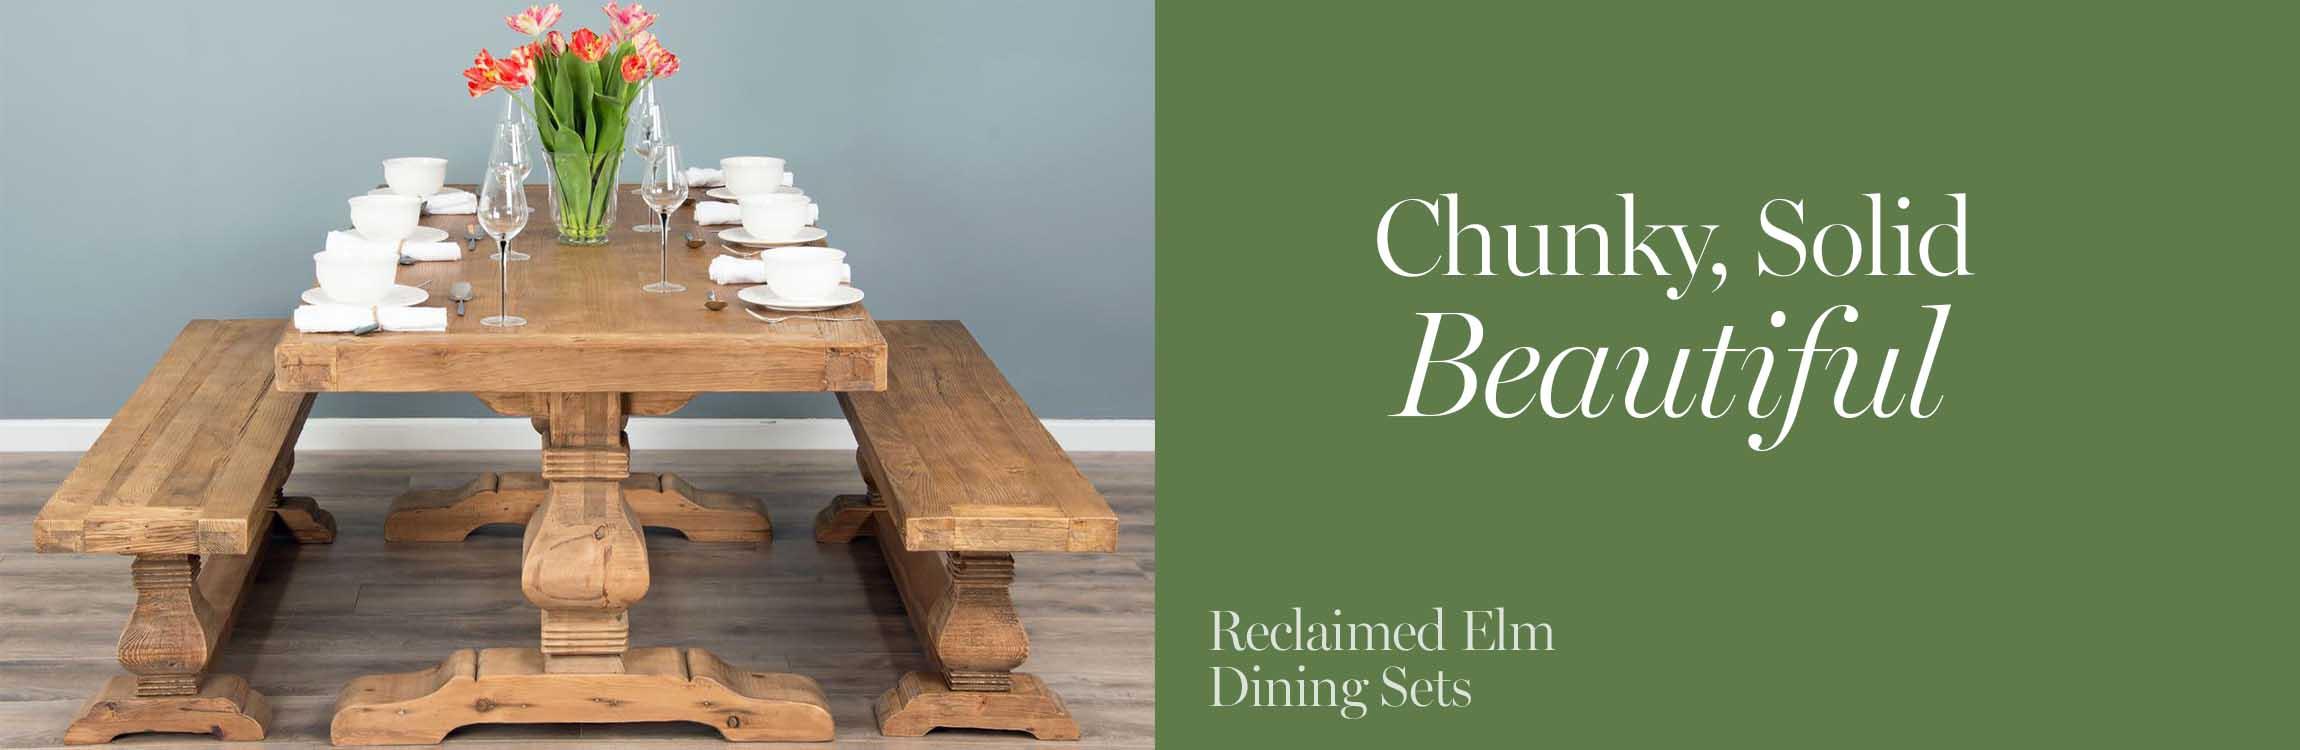 Reclaimed Elm Dining Sets